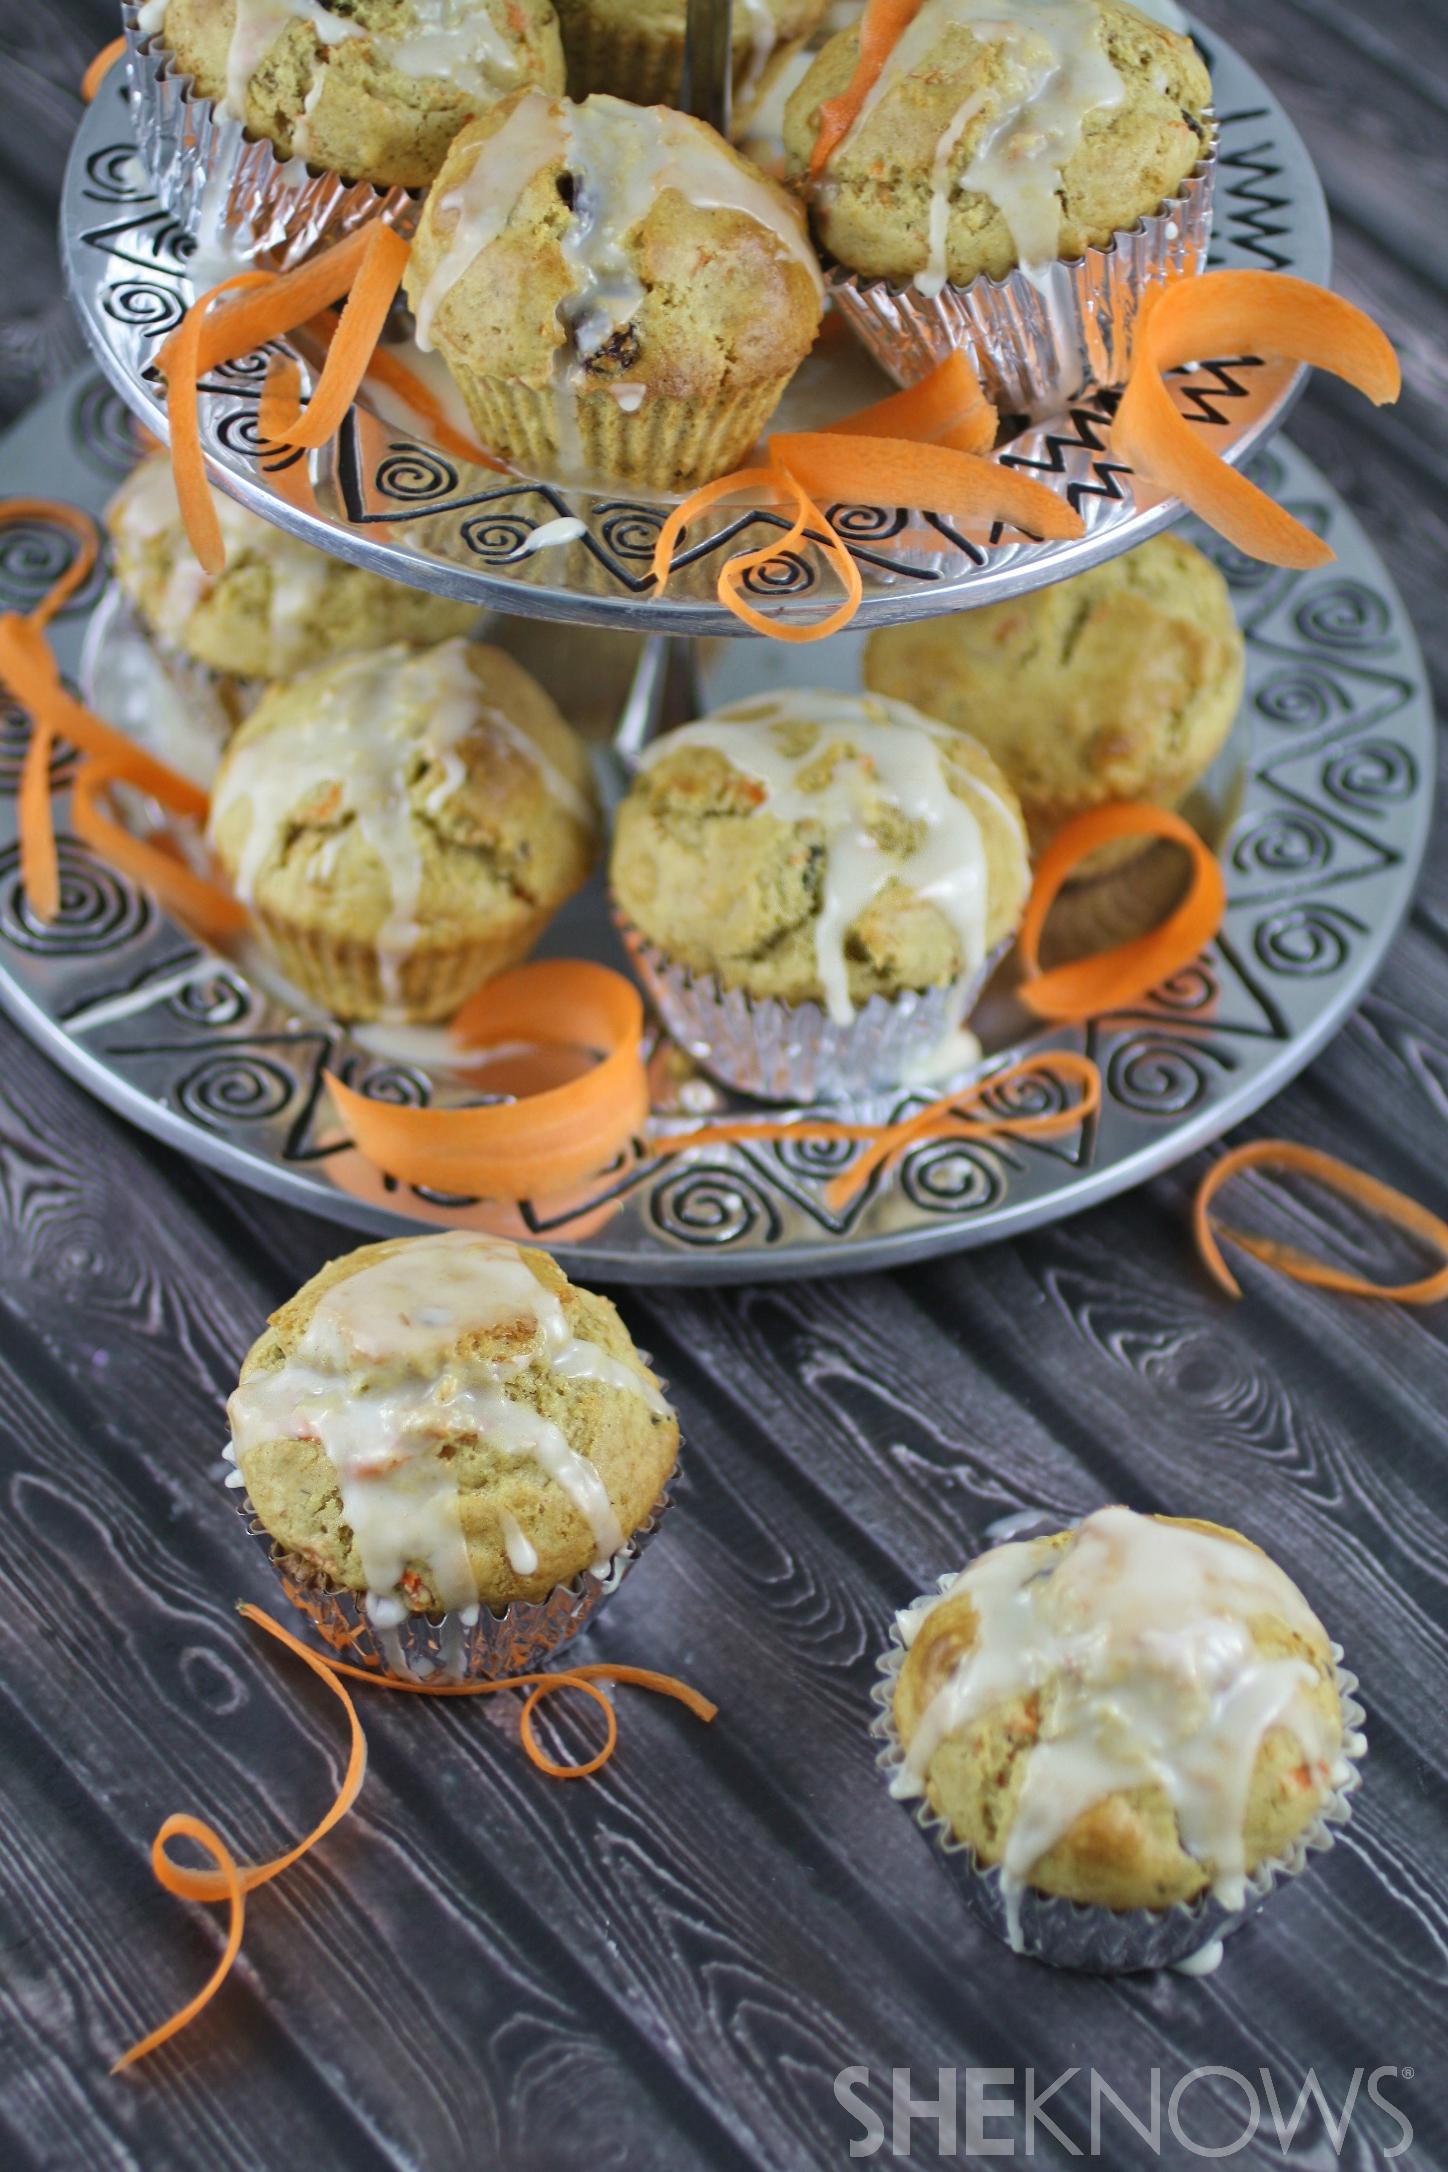 Gluten-free carrot cake muffins with lemon-ginger glaze recipe